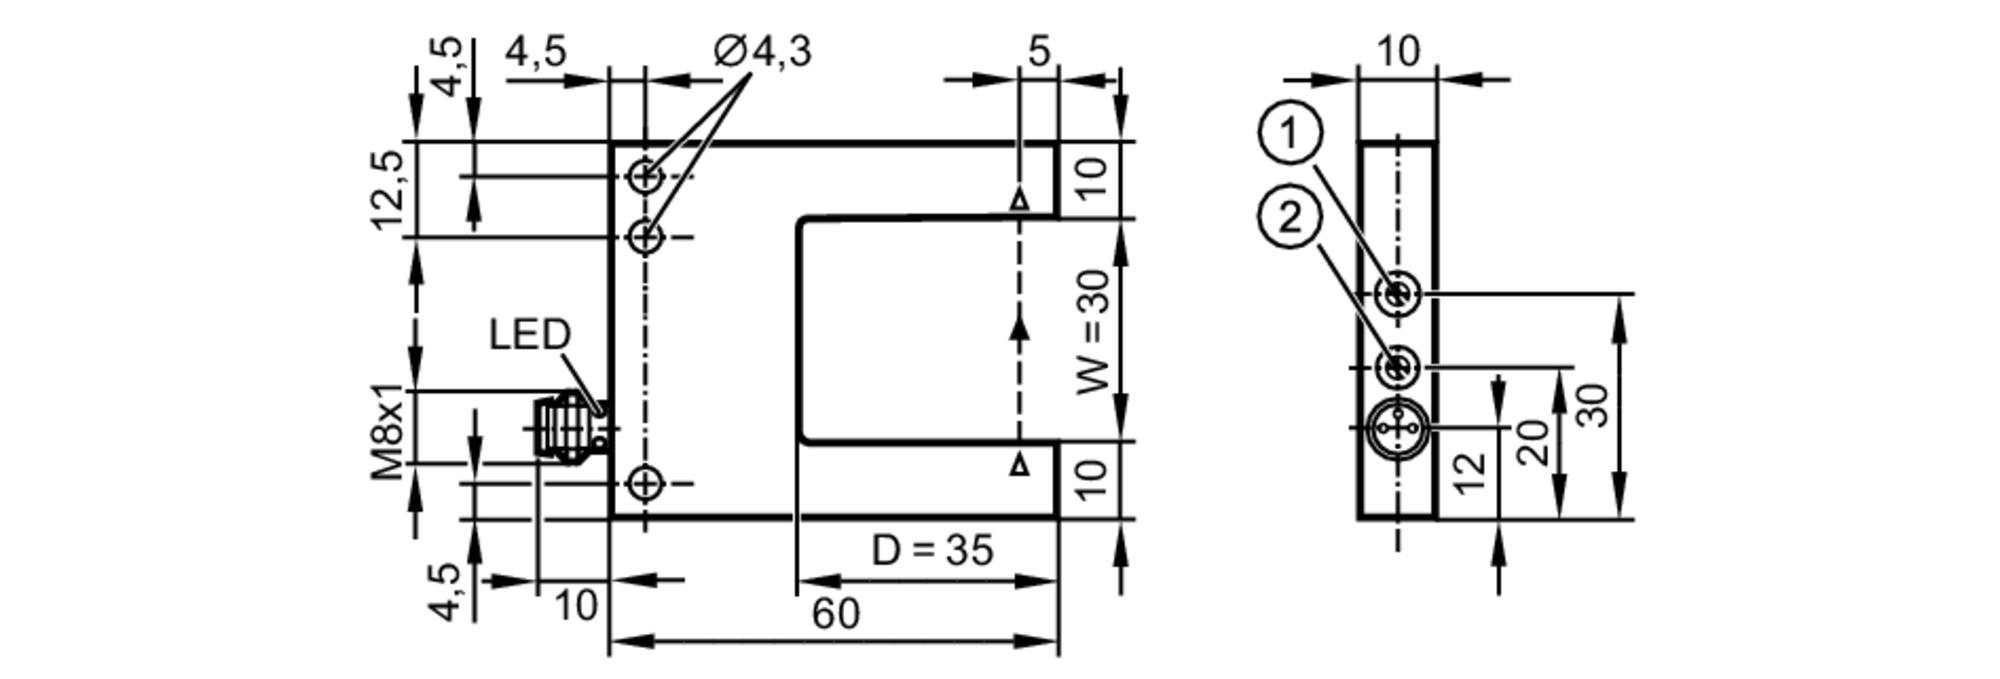 opu202 - photoelectric fork sensor